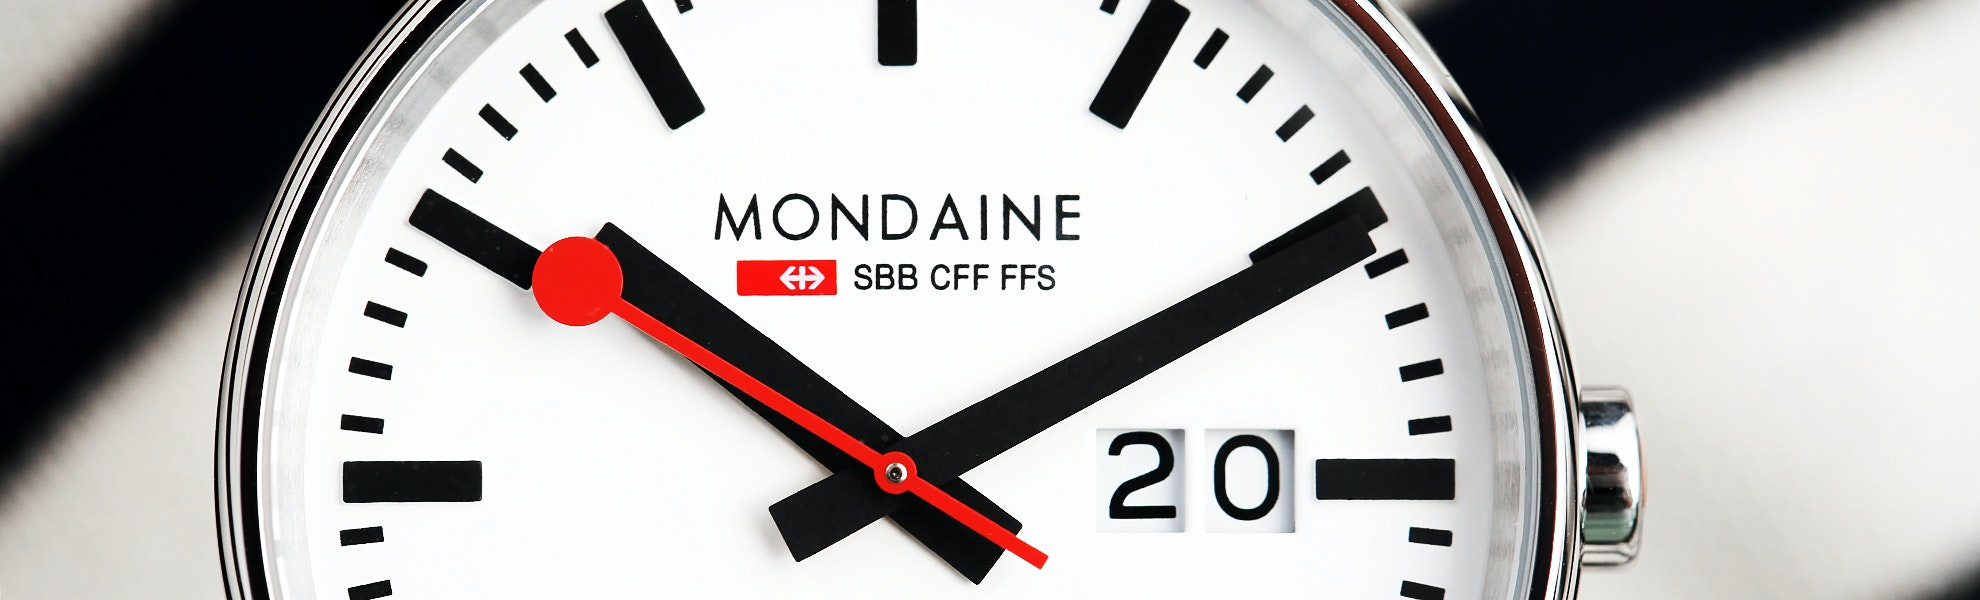 Mondaine Evo Big Date Quartz Watch